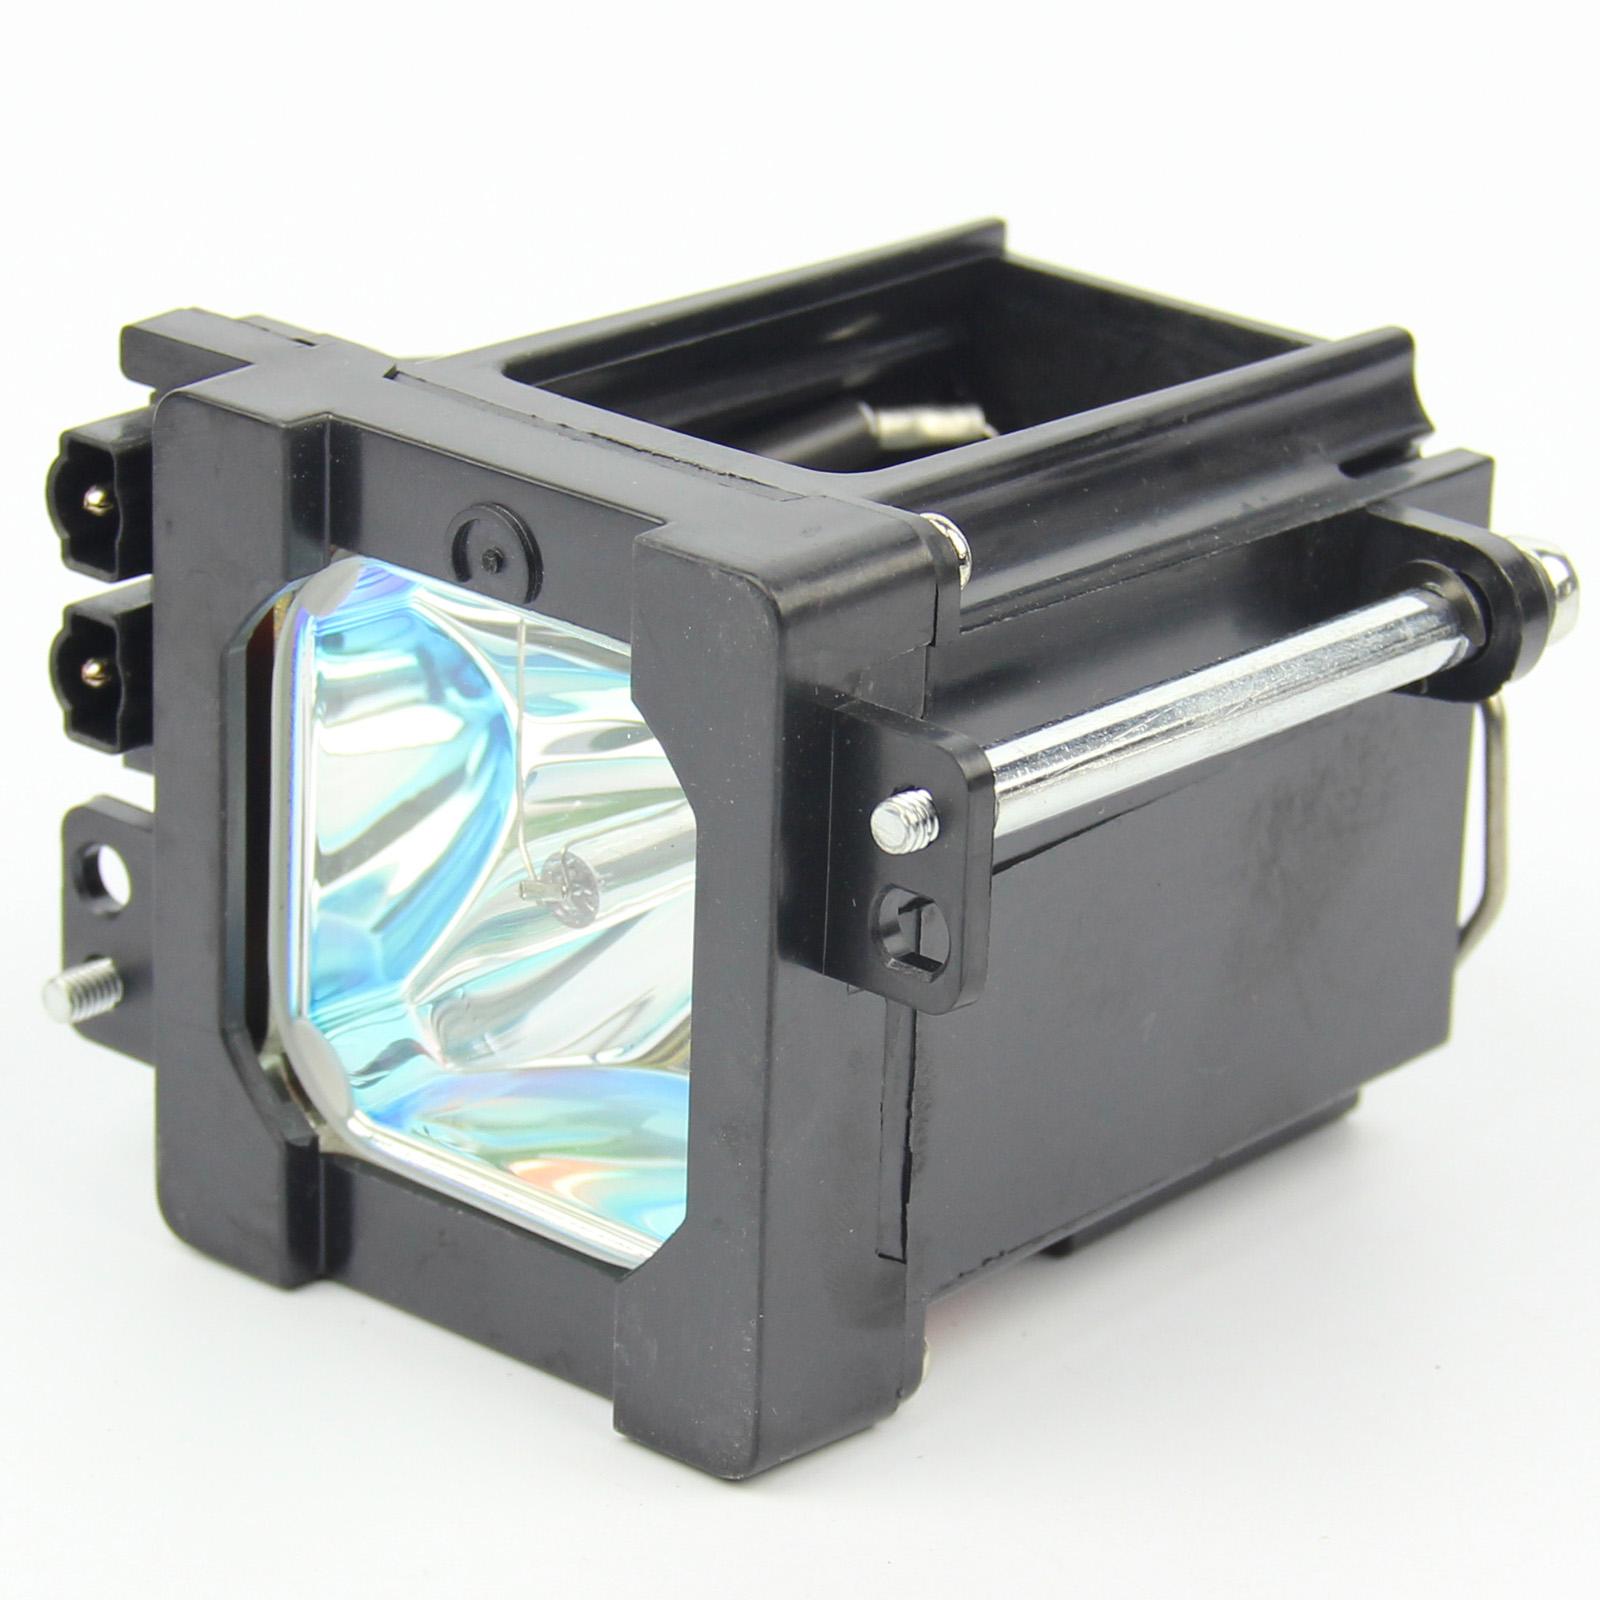 compatibleTS-CL110U TS-CL110UA TS-CL110UAA for JVC HD-52G886 HD-52G887 HD-52Z575